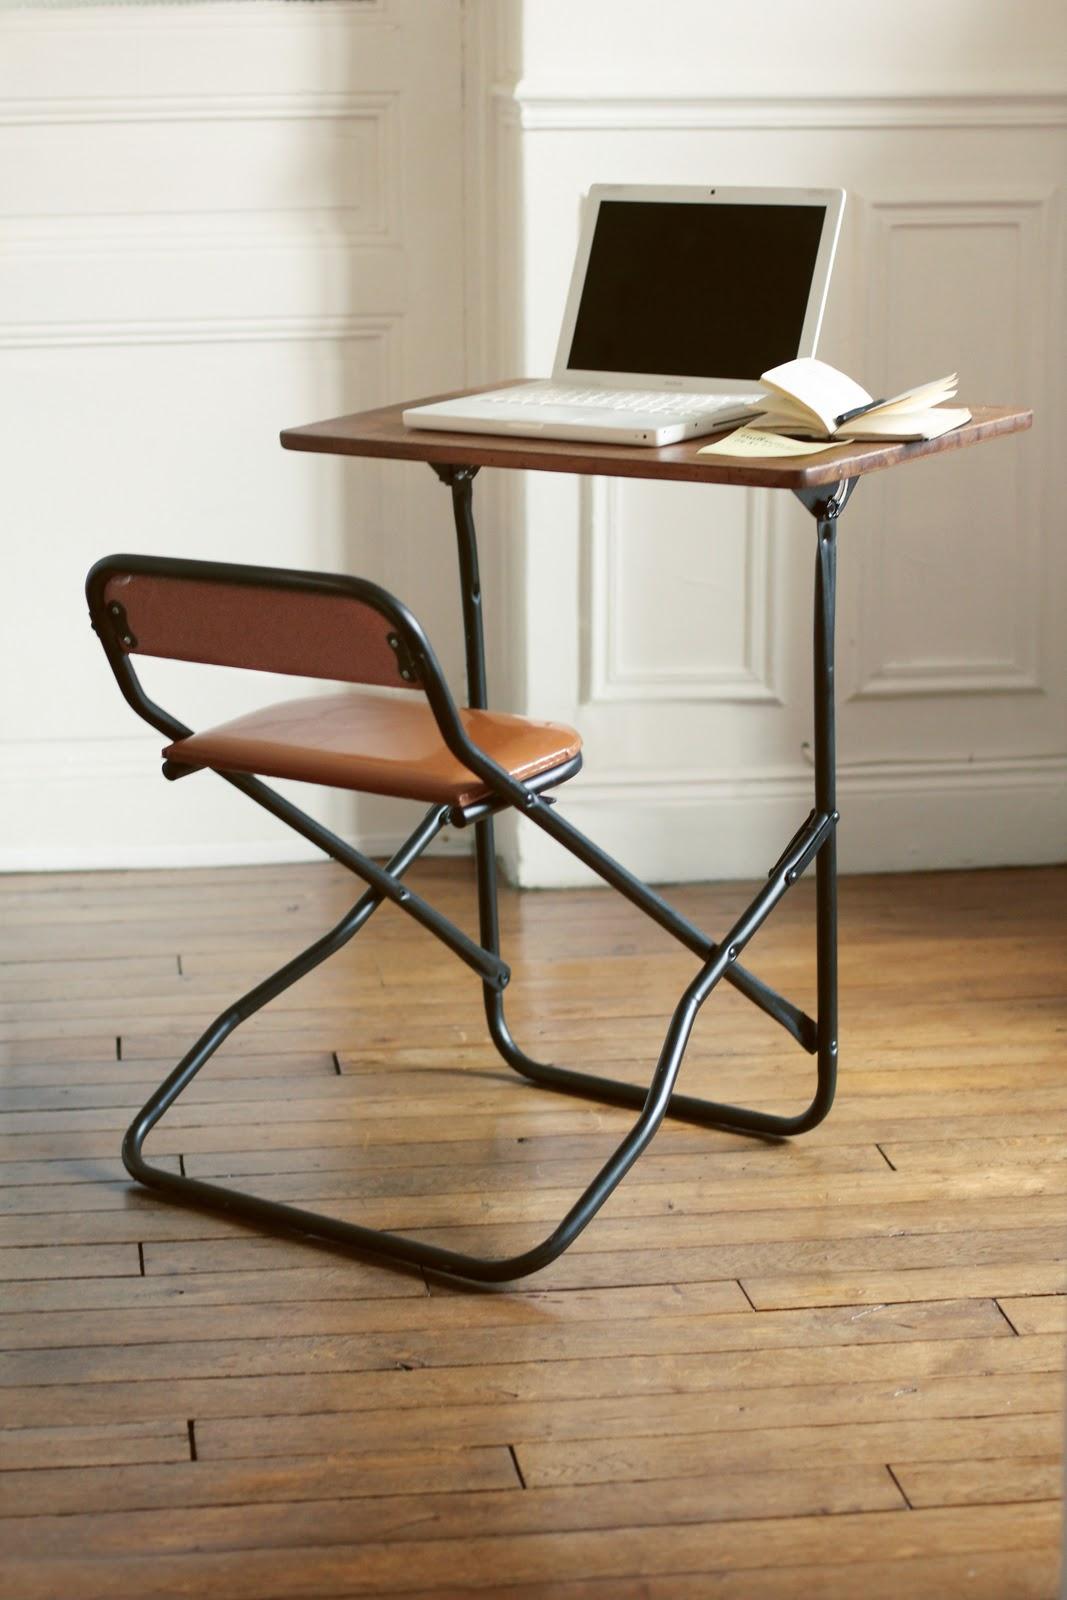 de derri re les fagots le petit bureau pliant 170 euros vendu. Black Bedroom Furniture Sets. Home Design Ideas